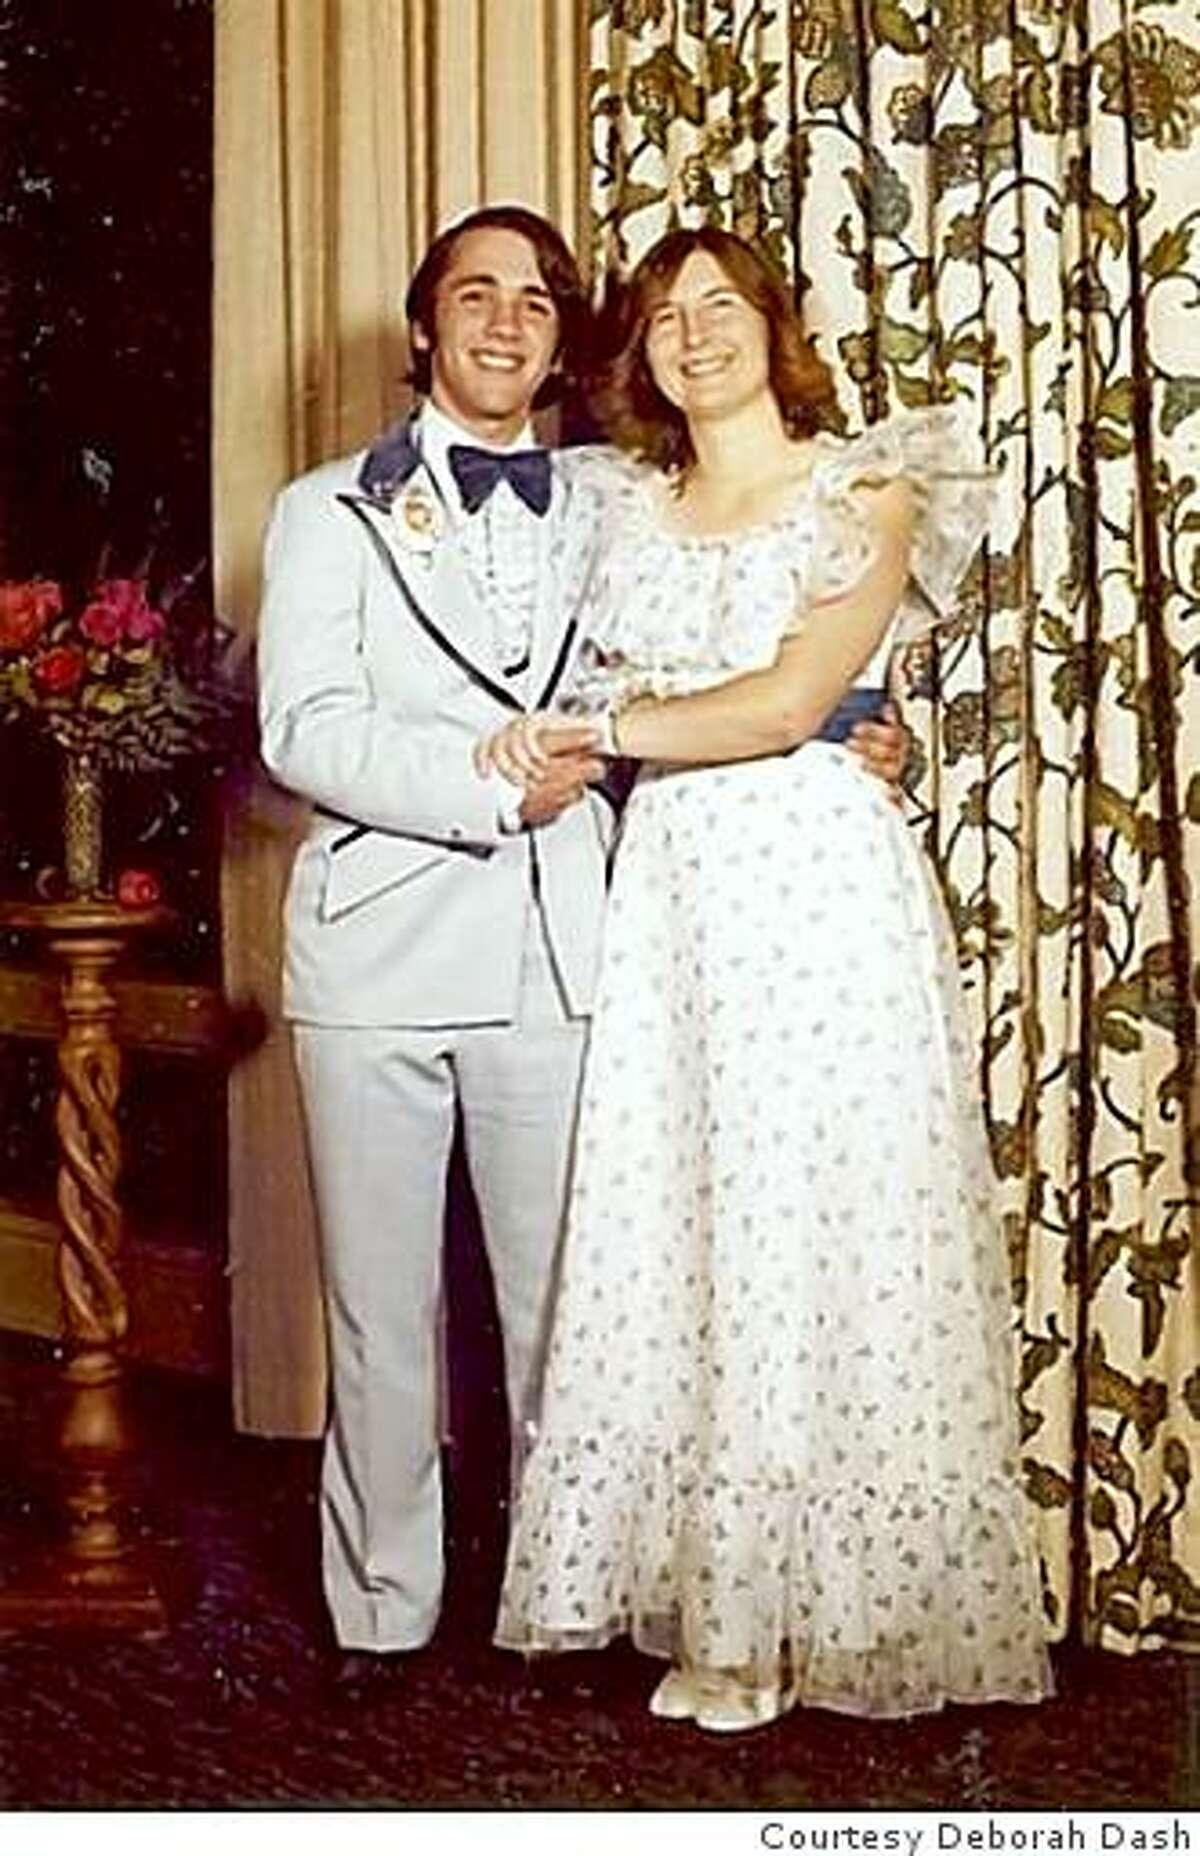 Deborah Dash with her now-husband at his 1978 Senior Ball.